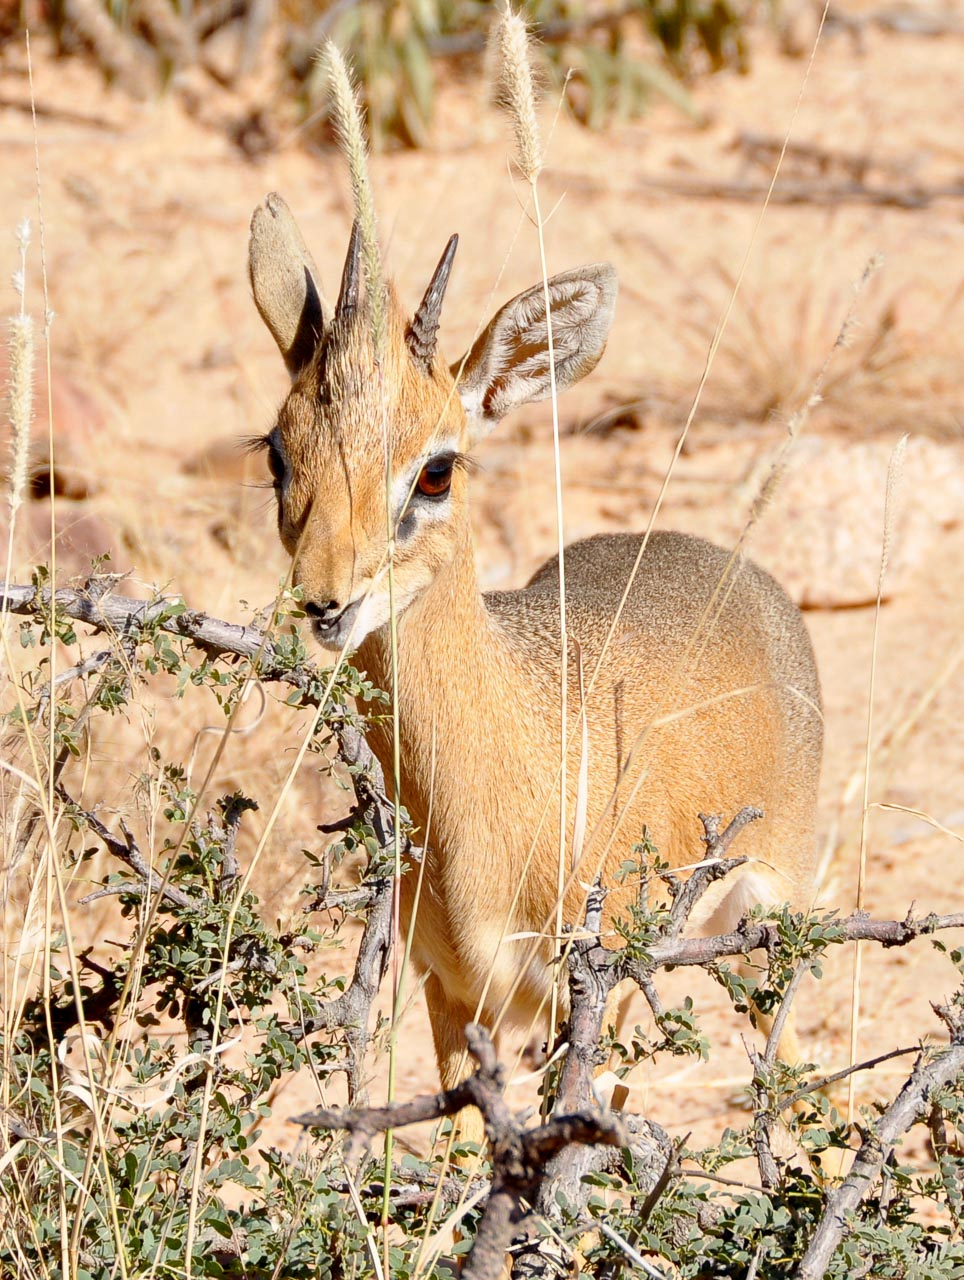 Okonjima-Namibia-Globetrotter-Select-23